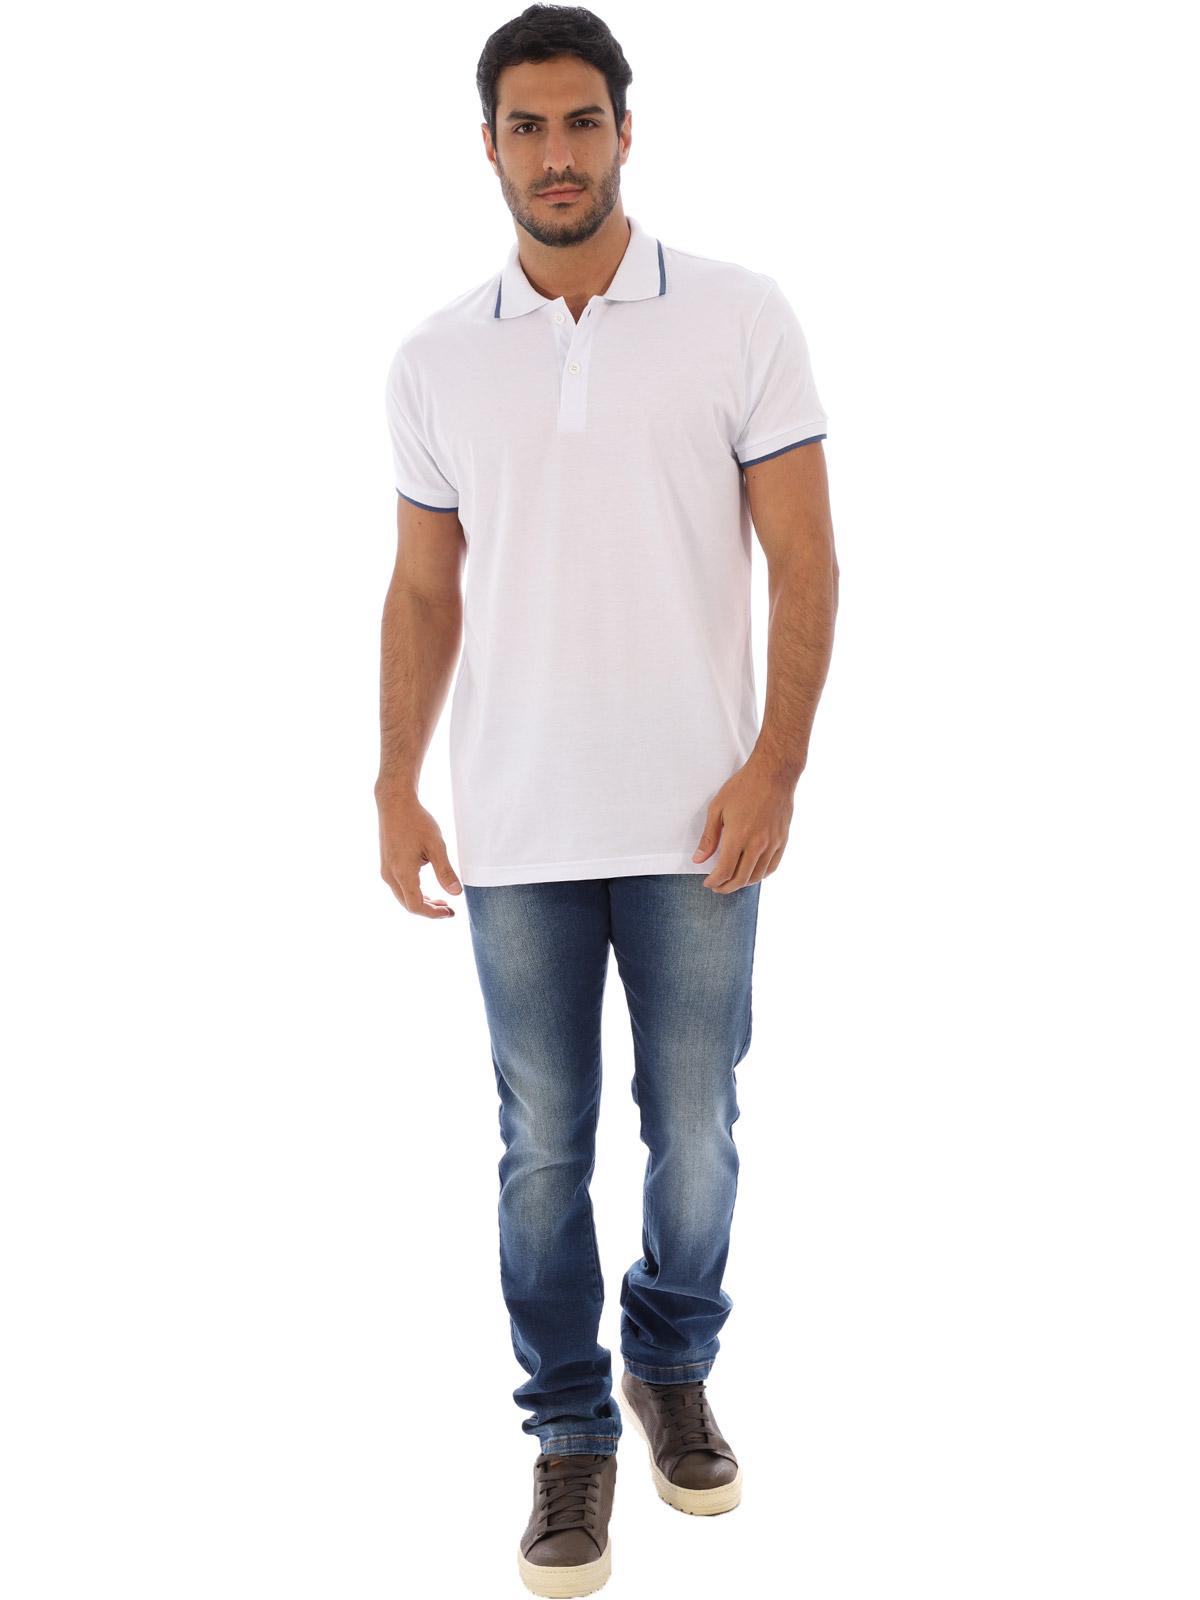 Camisa Polo Masculina Lisa Com Punho Filete Branca